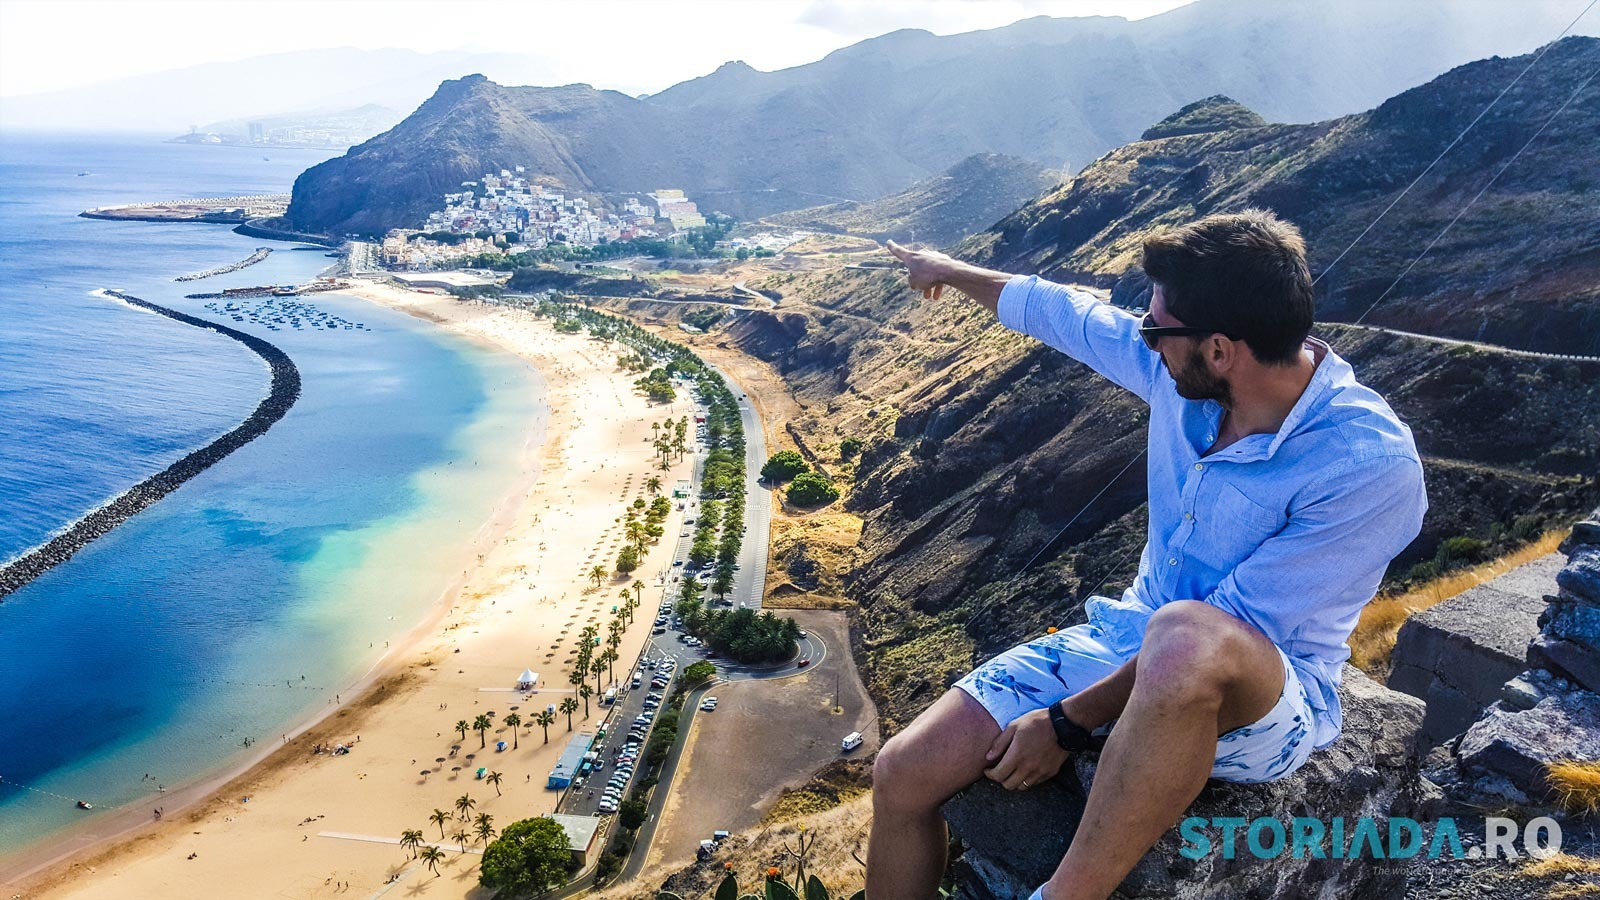 Las Teresitas, Santa Cruz de Tenerife